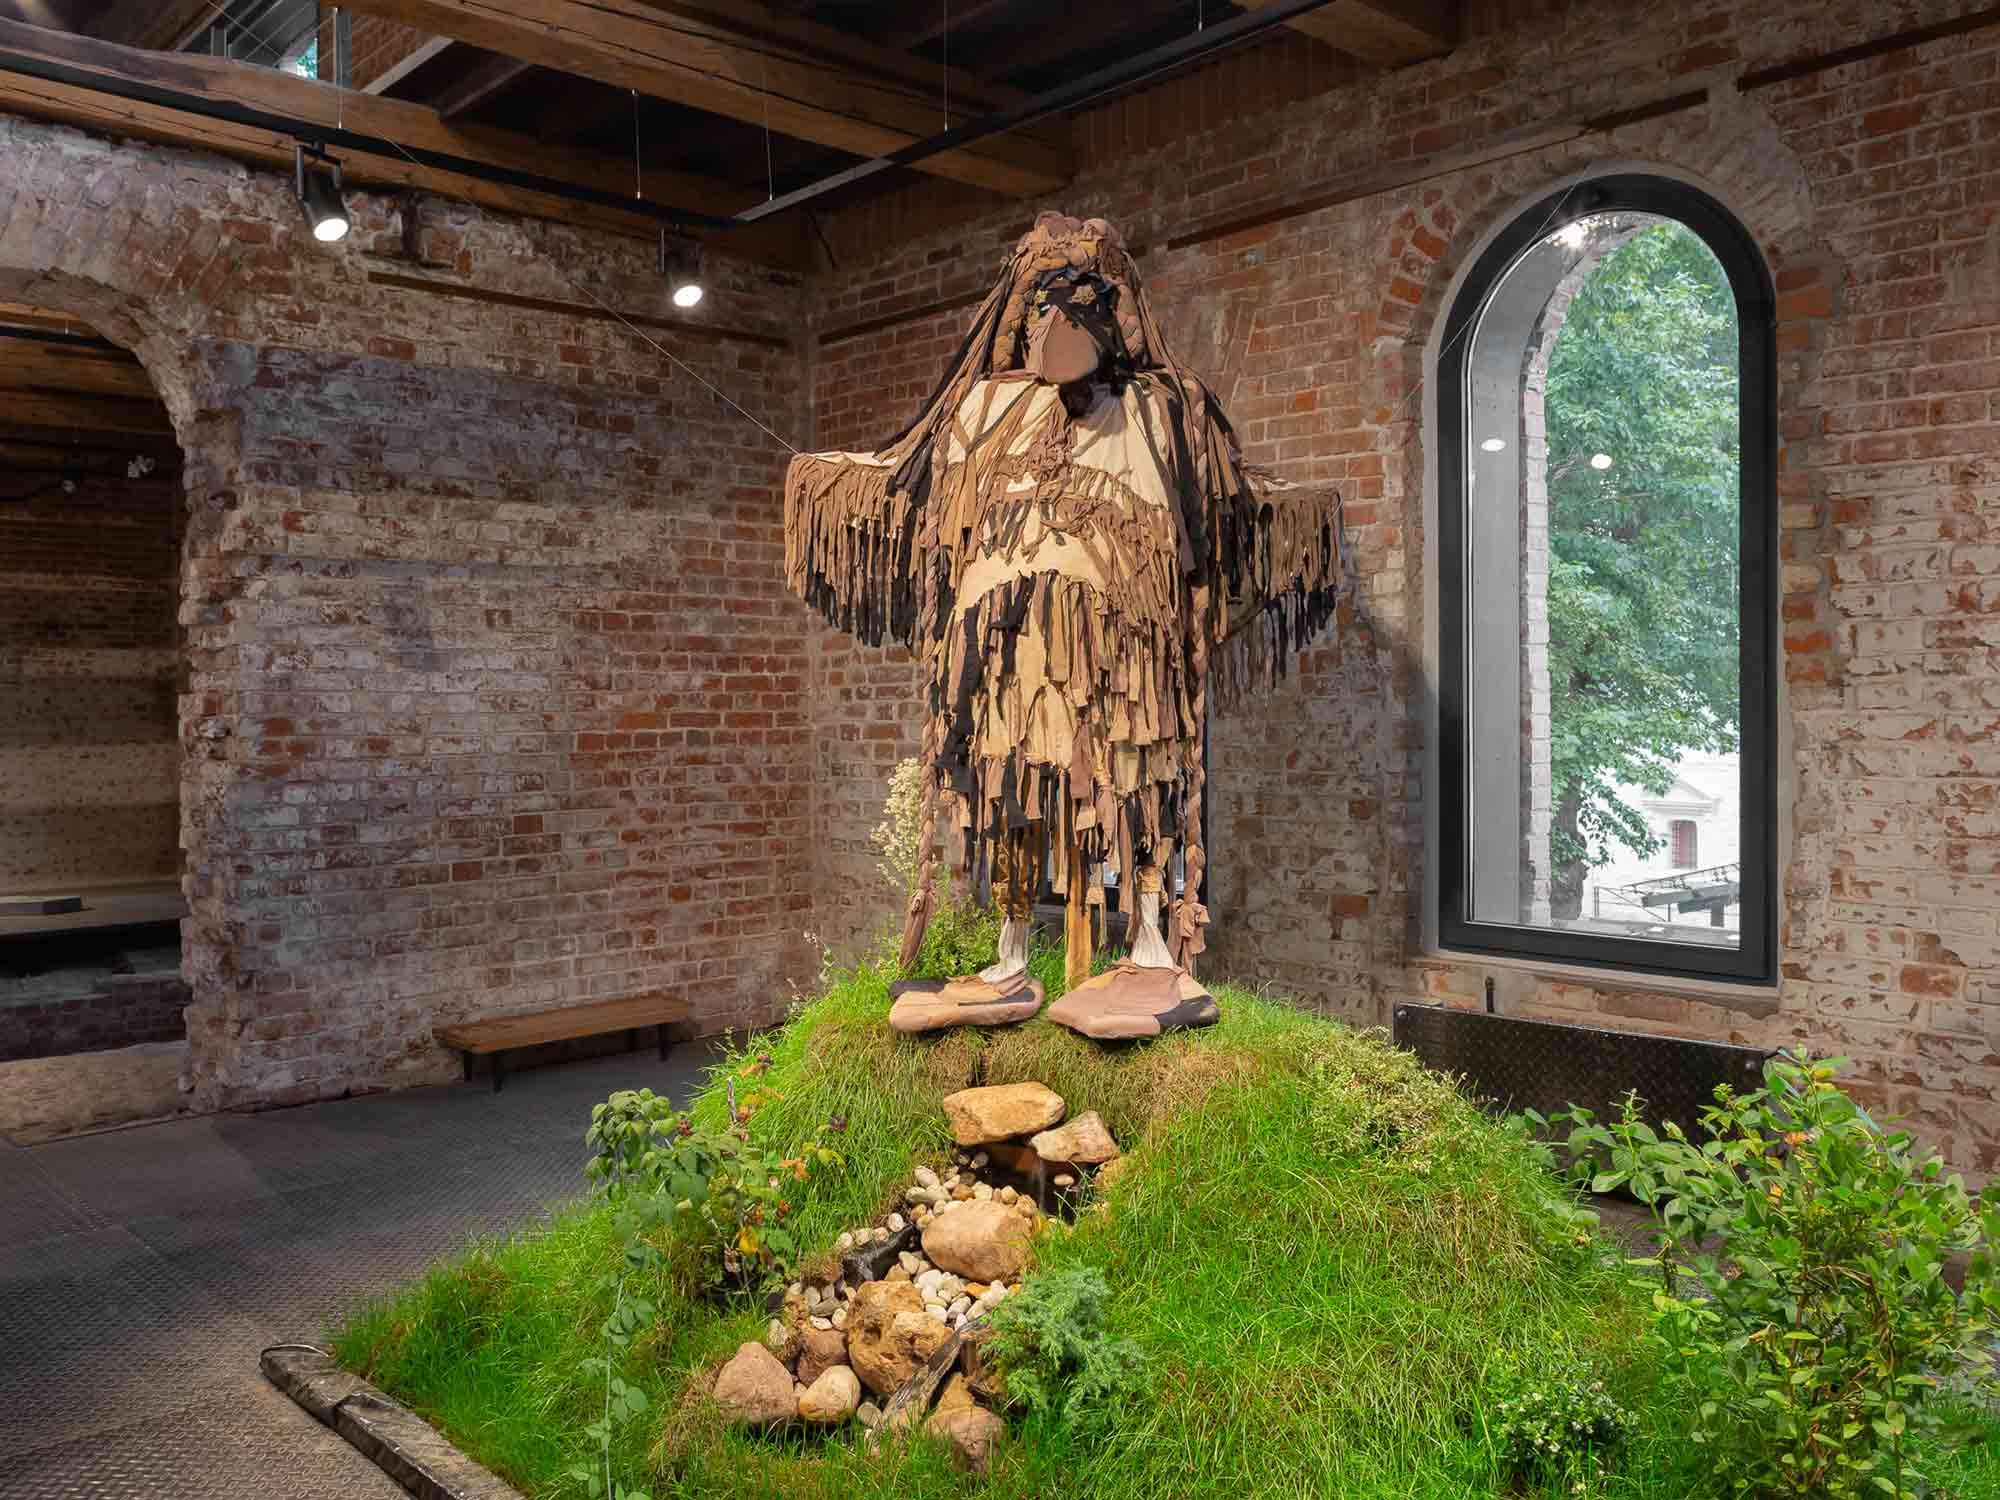 Sergey Kishchenko, Maxim Ilyukhin, King of the Hill (Tsar Mountains), (2017-2018). A mixed-media installation in the Form of an Ecosystem